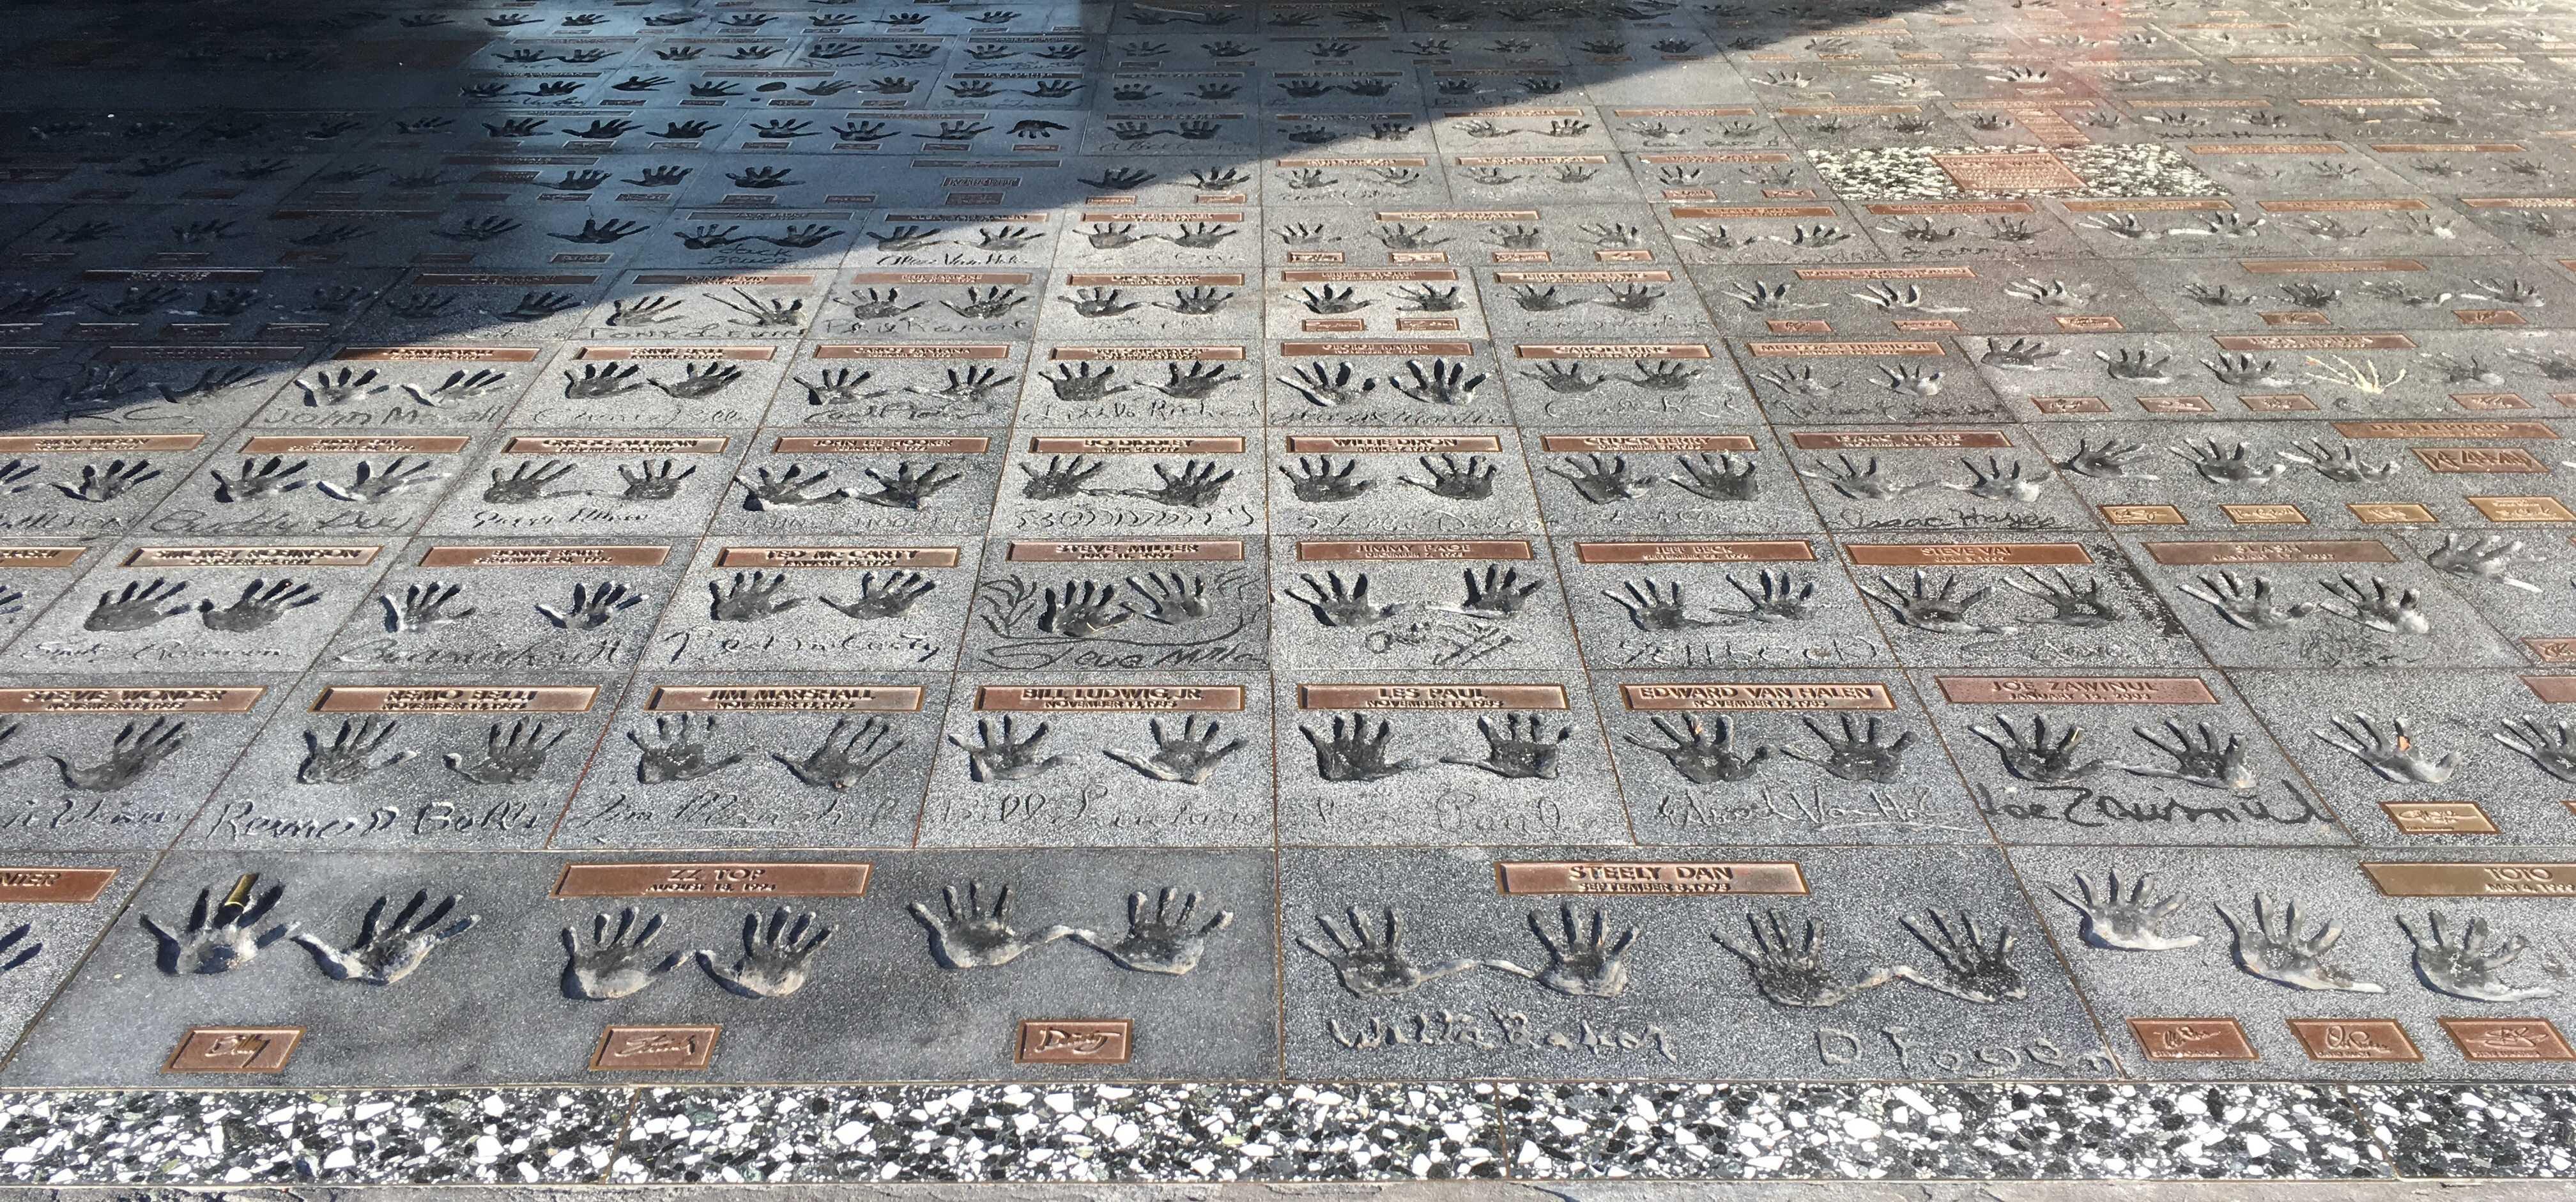 Sidewalk with hand prints